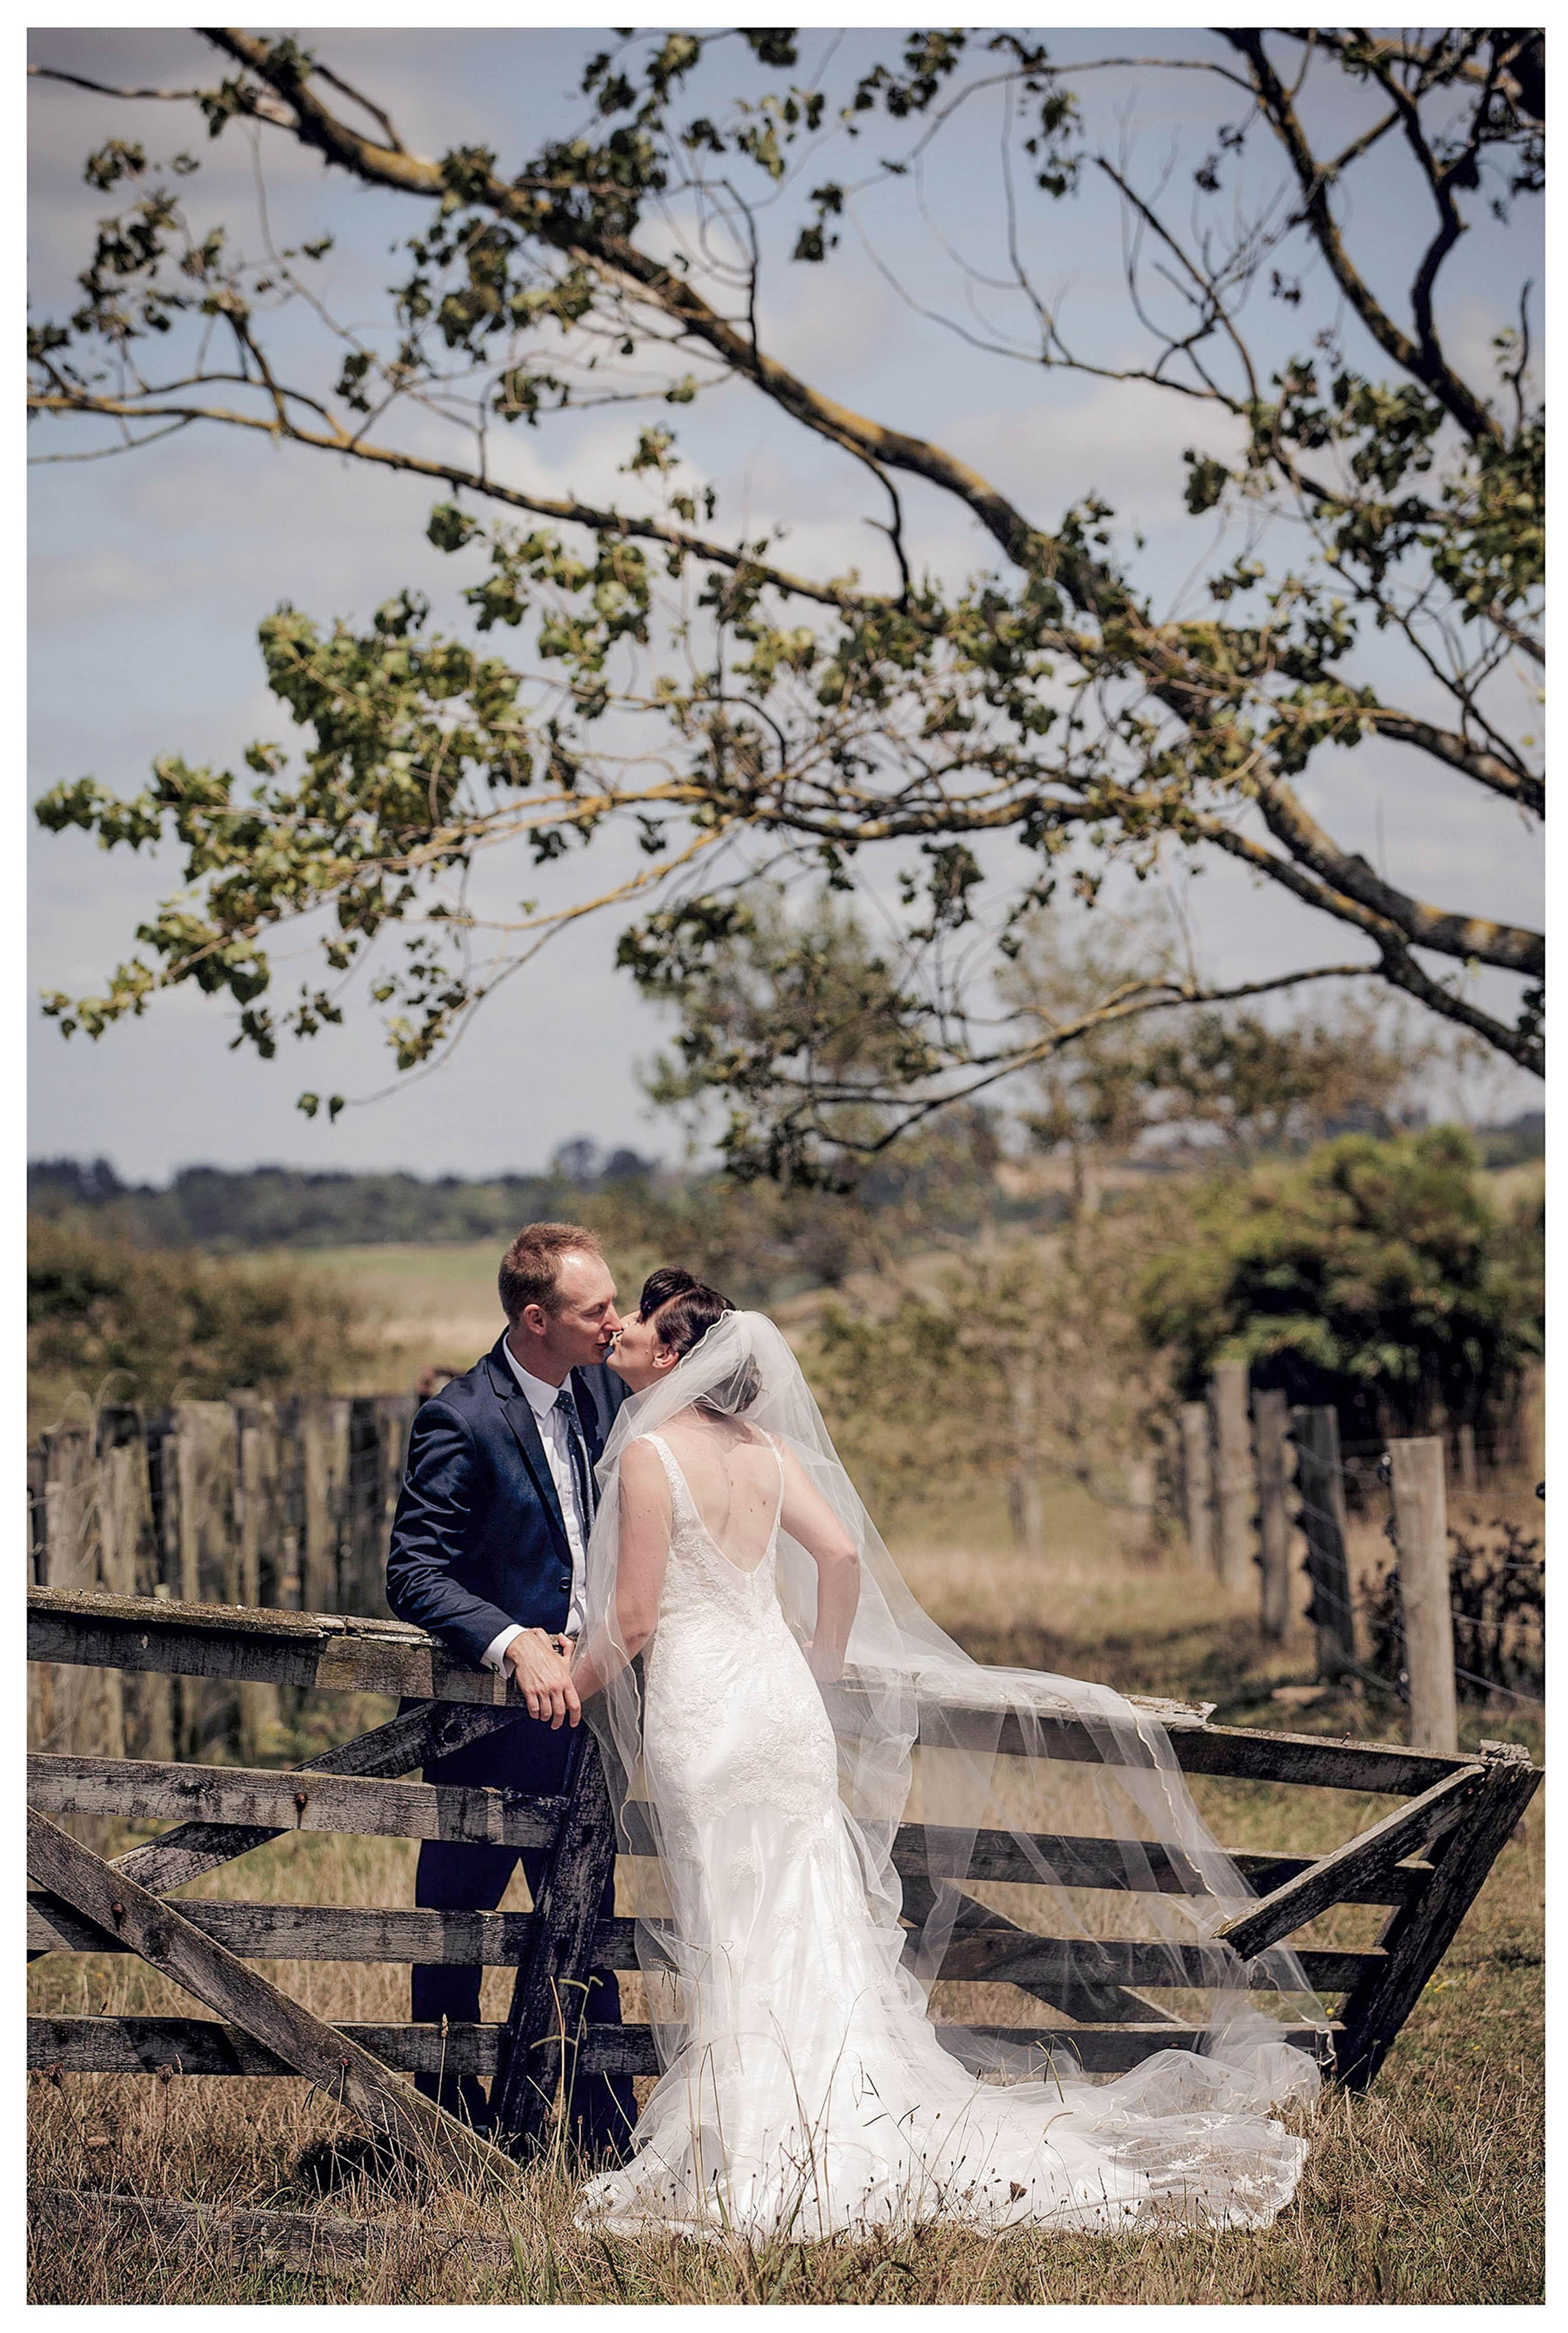 wedding photograph by Auckland wedding photographer Chris Loufte www.theweddingphotographer.co.nz farm wedding